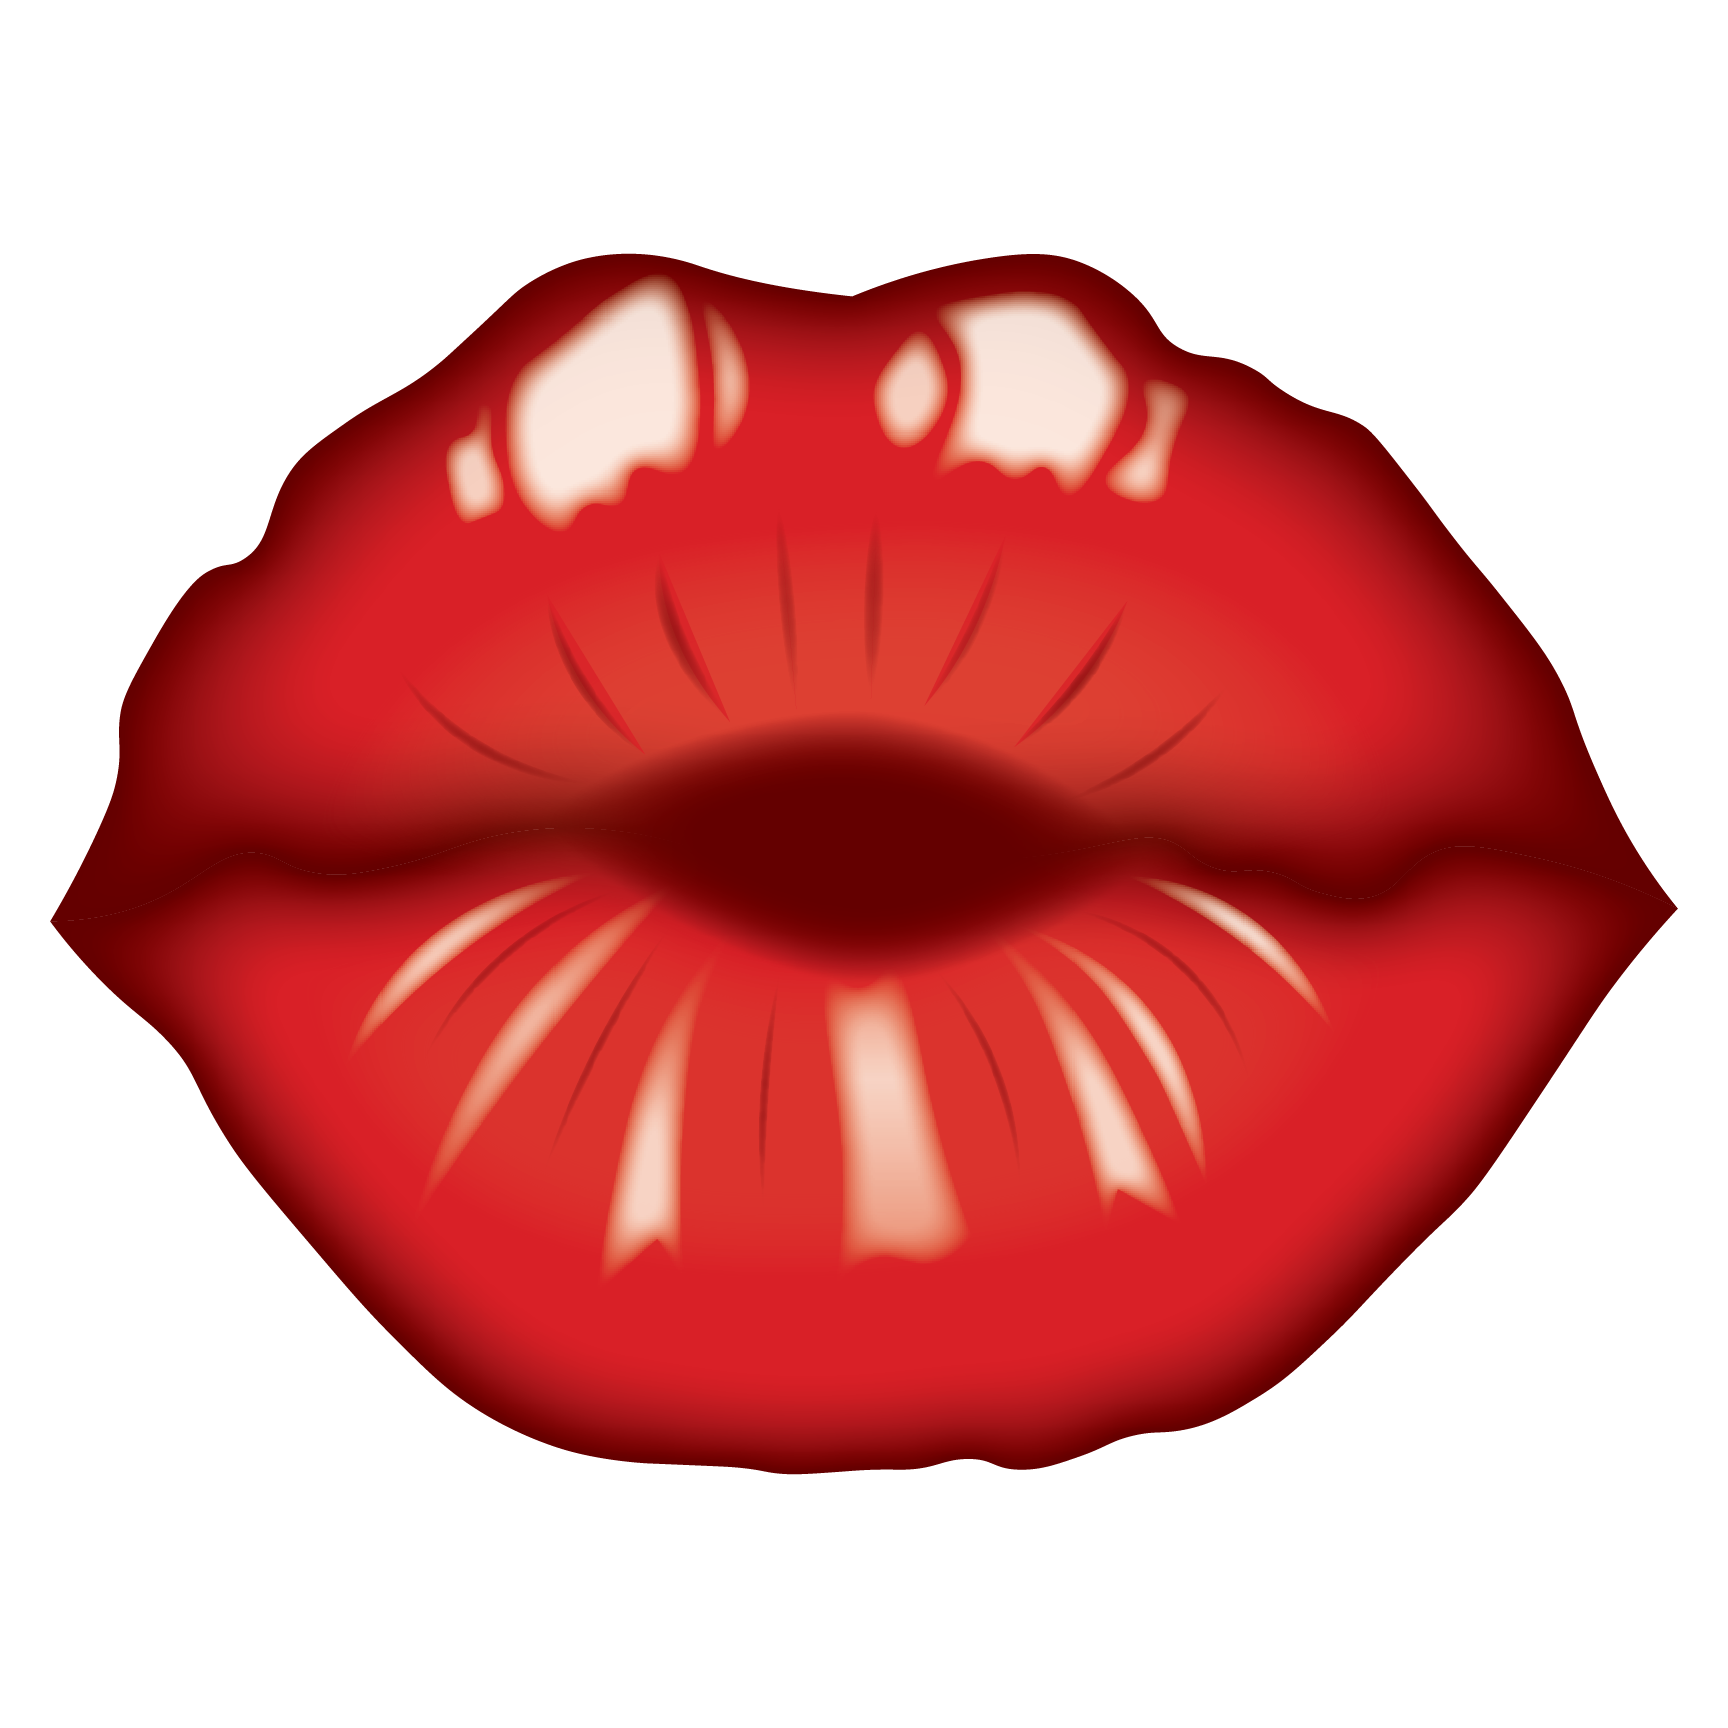 Laura ruesch project. Lips clipart pretty lip